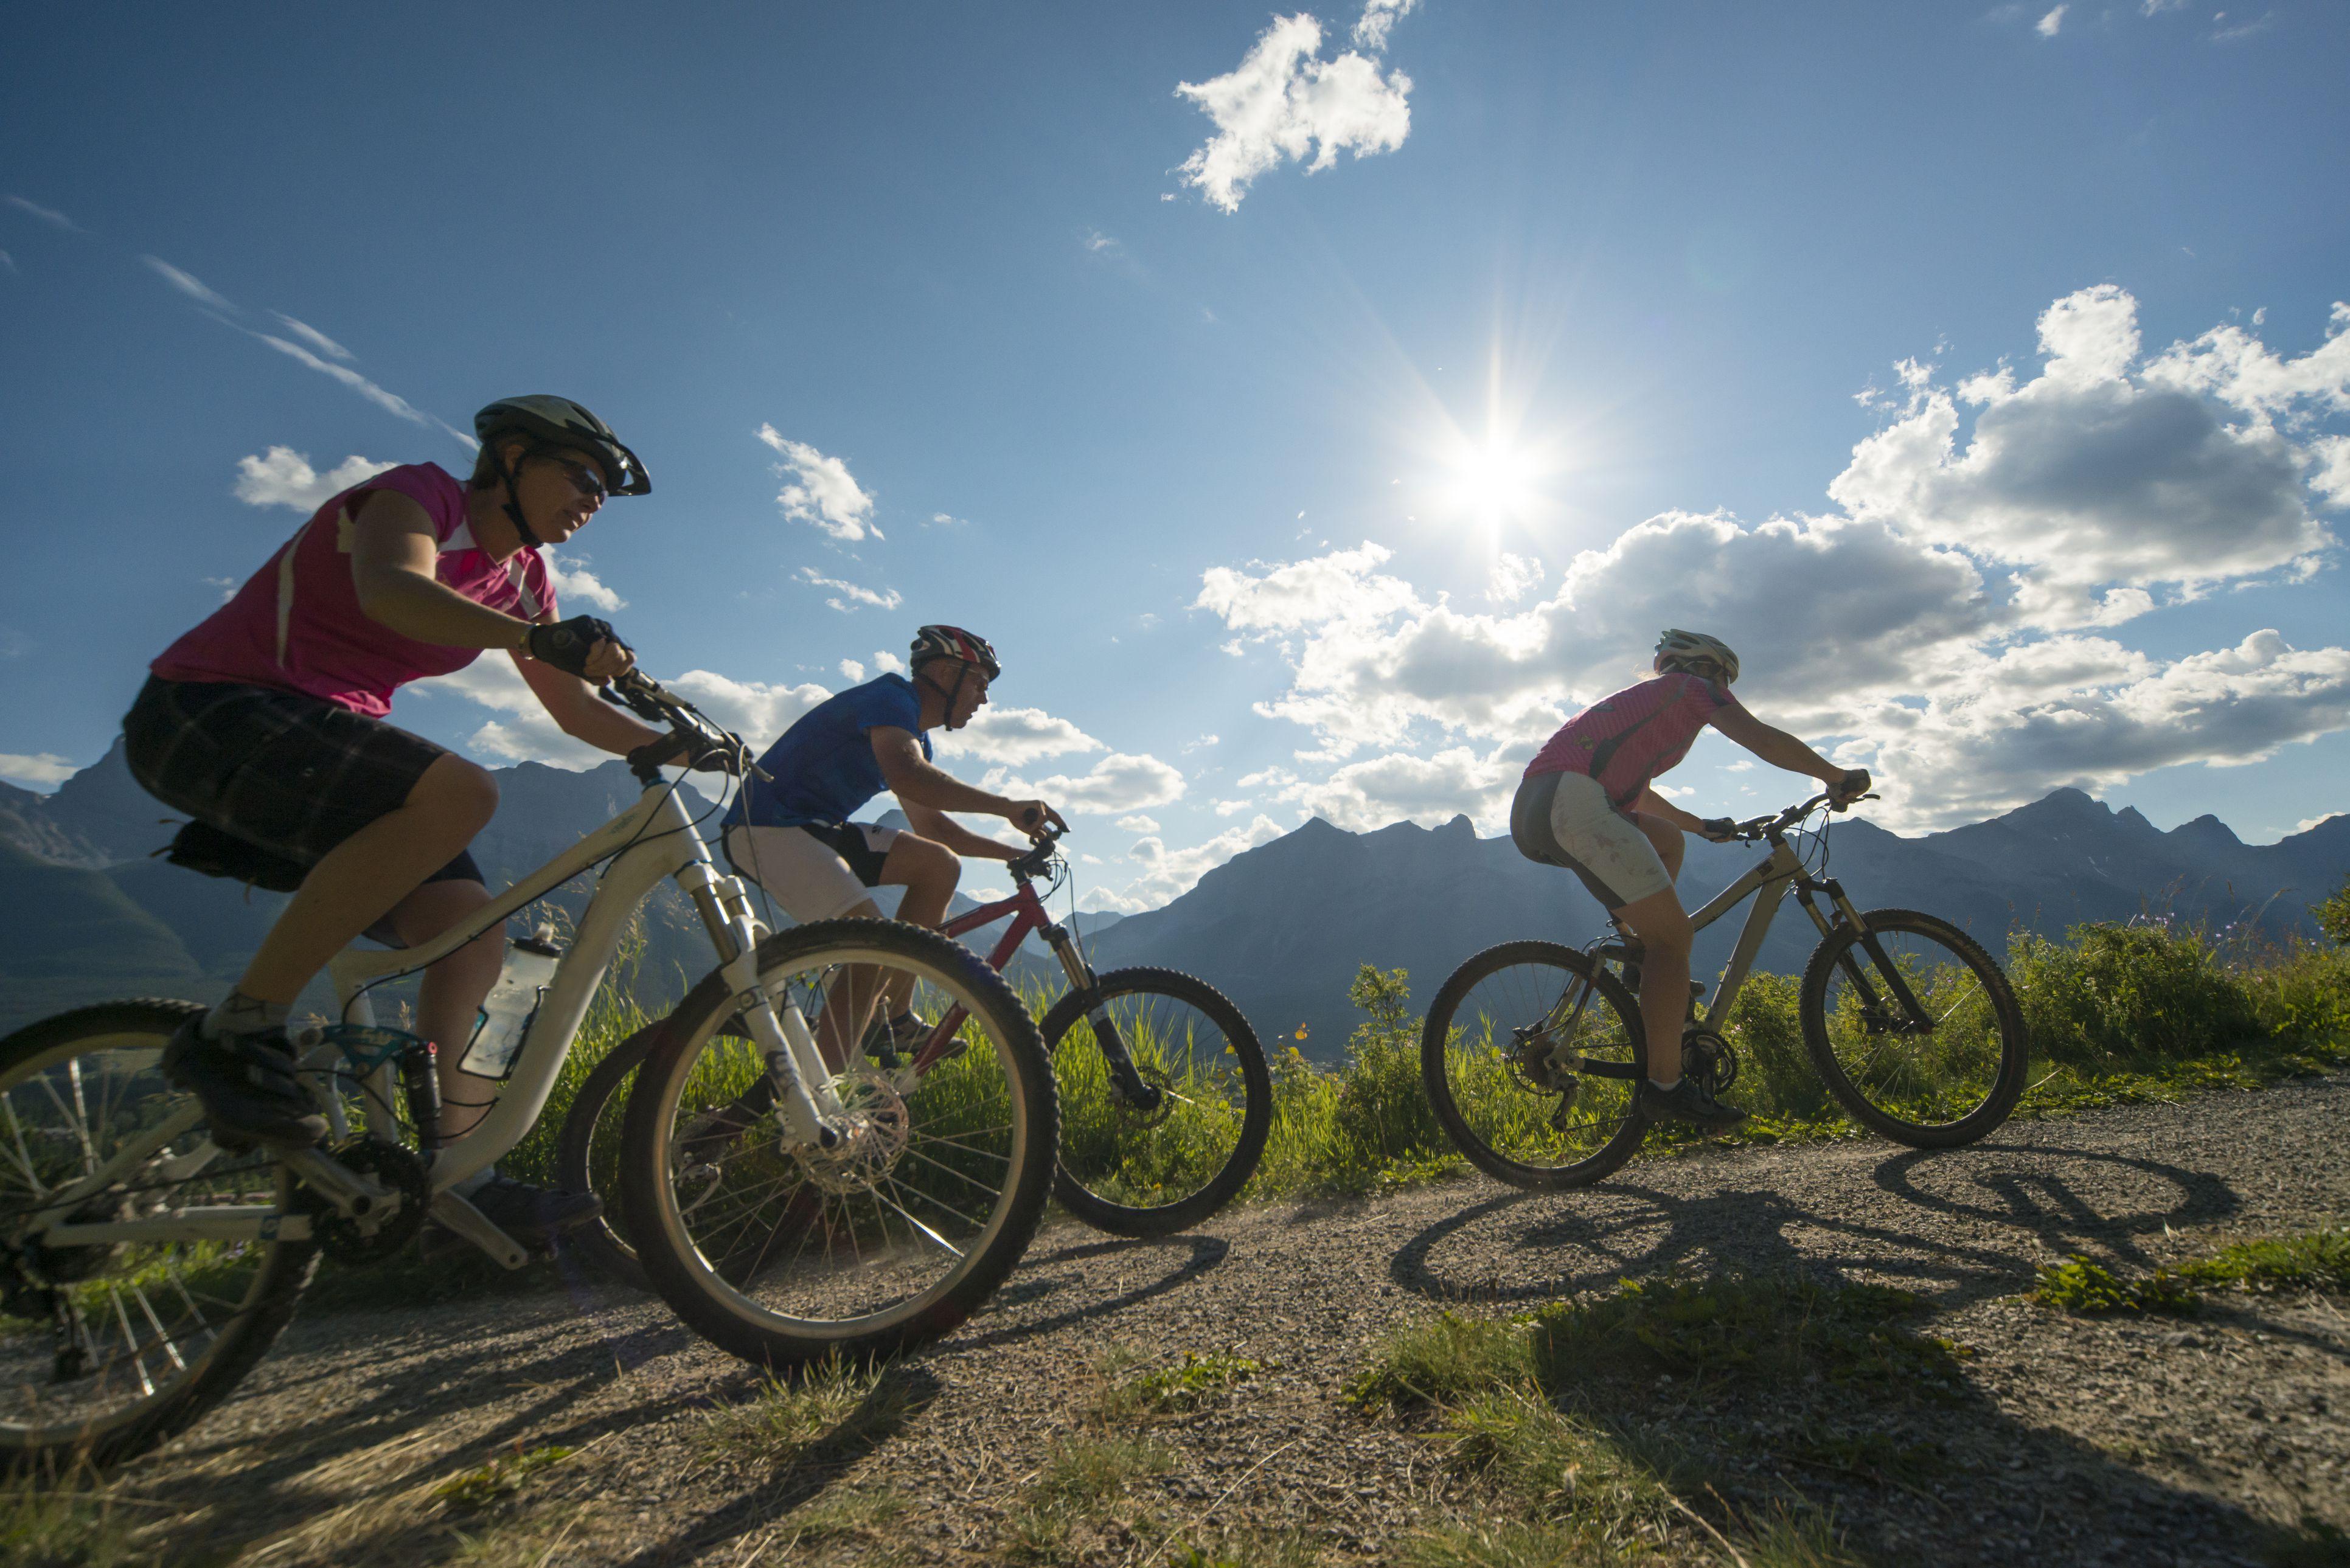 Mountain bikers race along path, in mountains